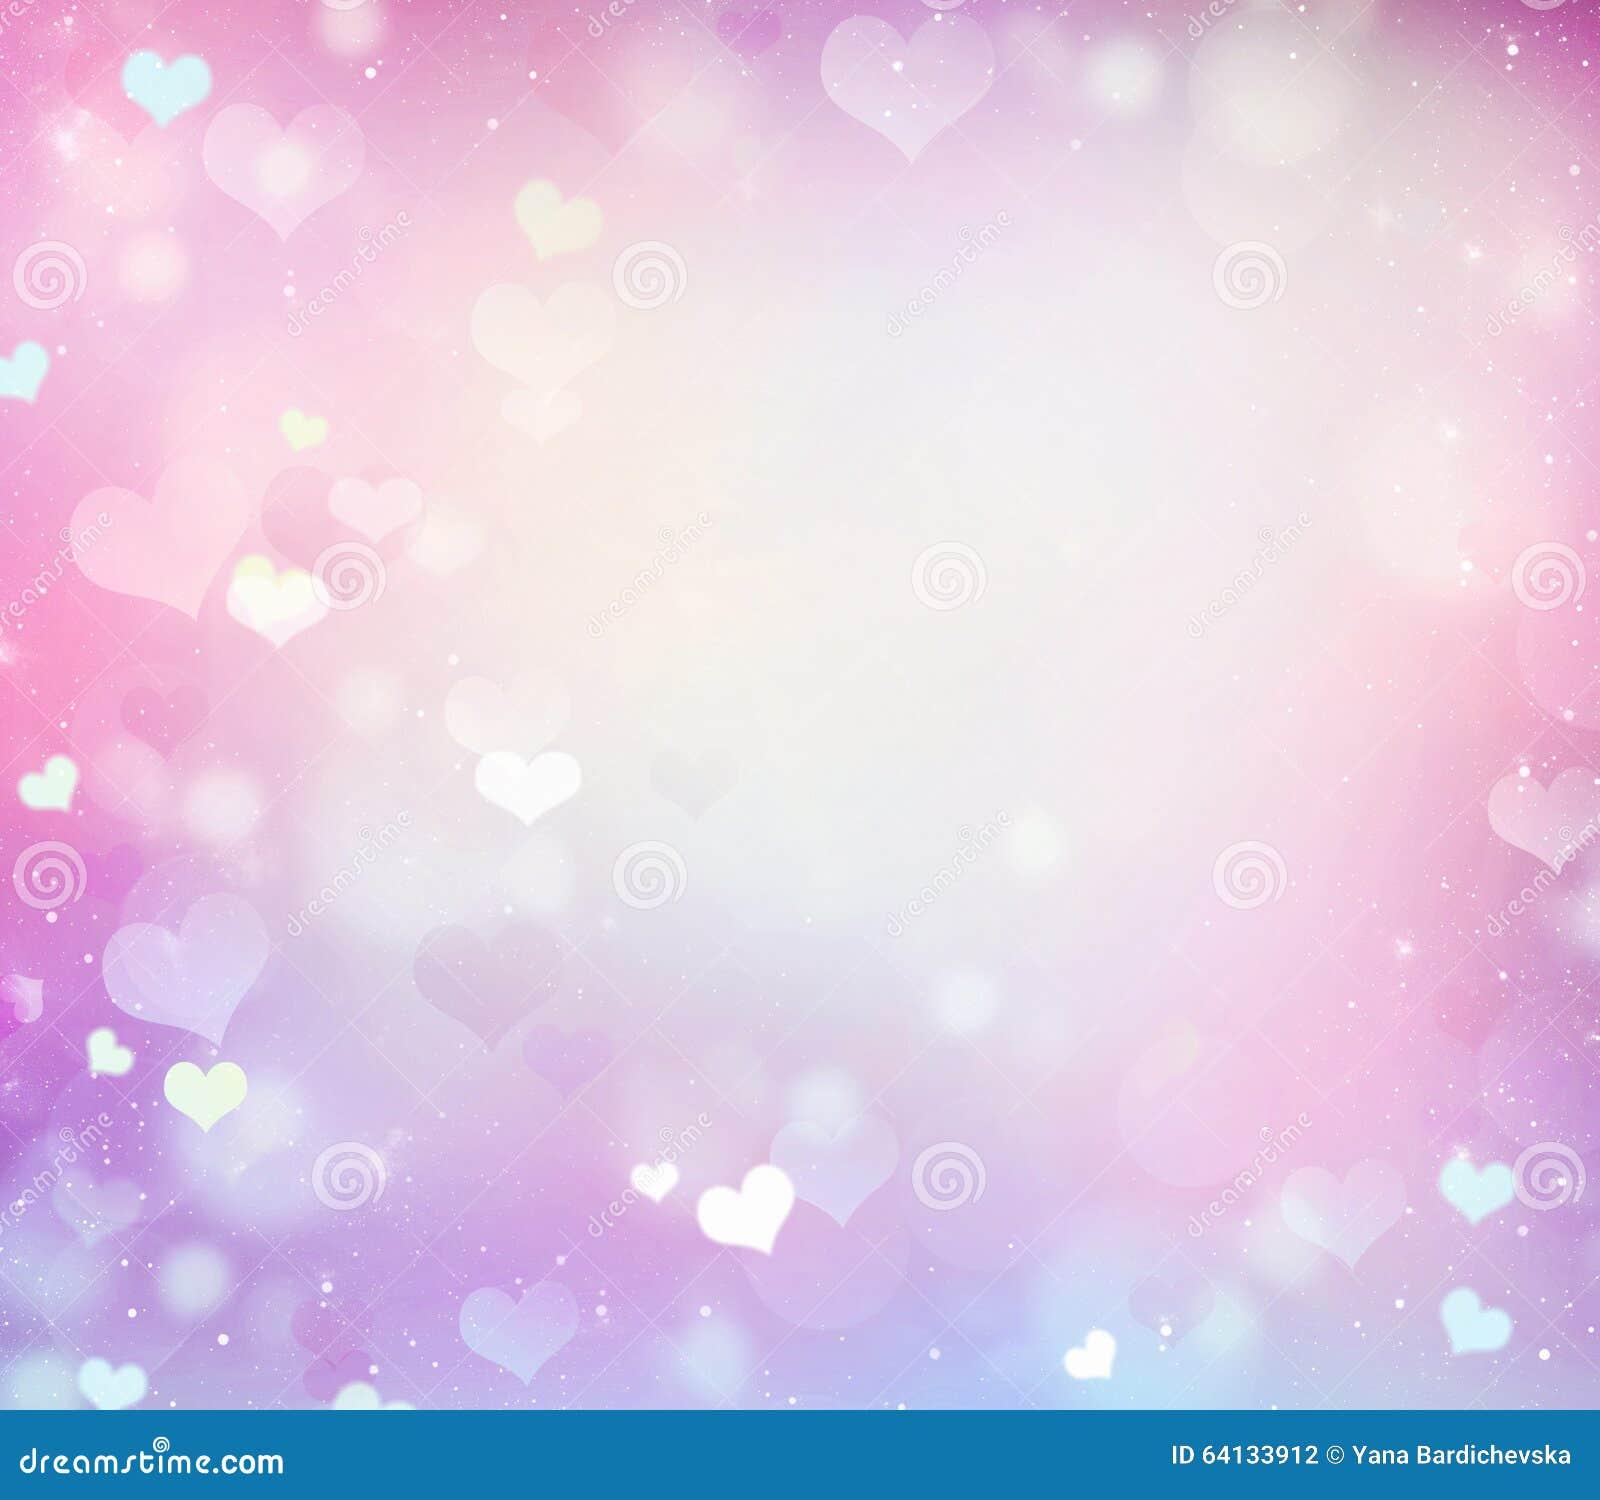 Pastel Romantic Pink Wedding Frame Background